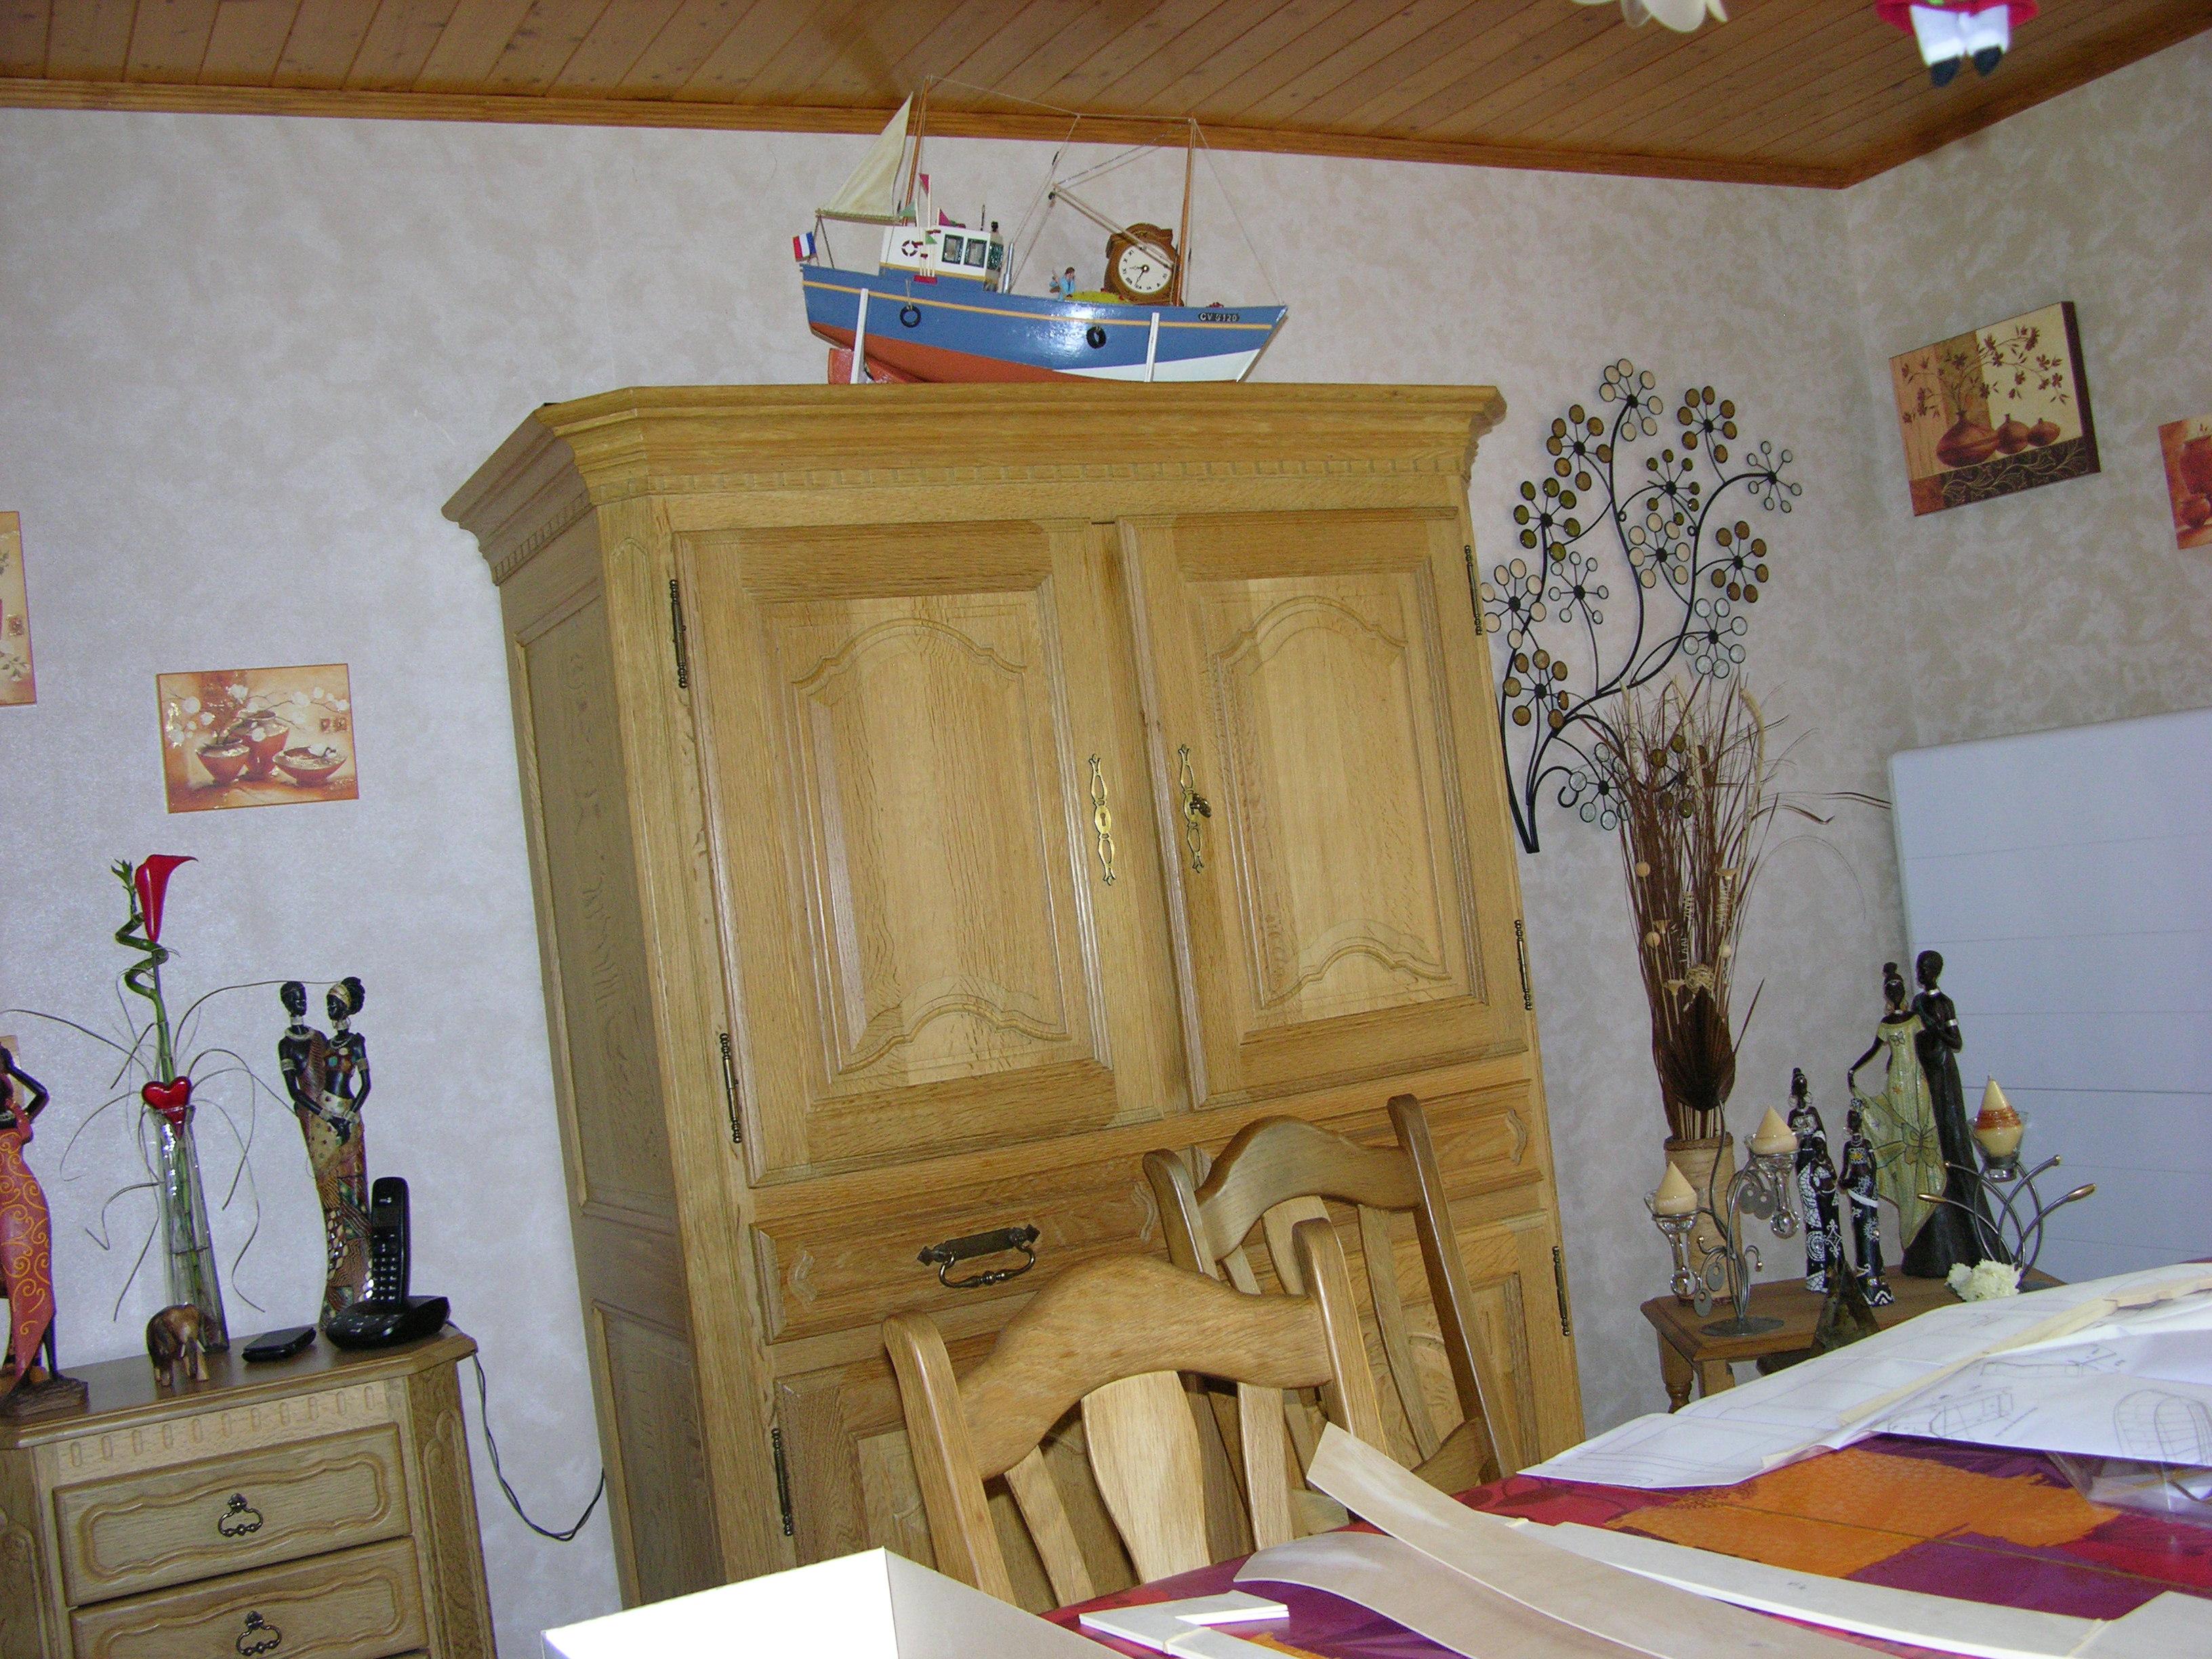 Sardinier JEANNINE MARIE au 1/20 kit SOCLAINE - Page 2 150802051613221471